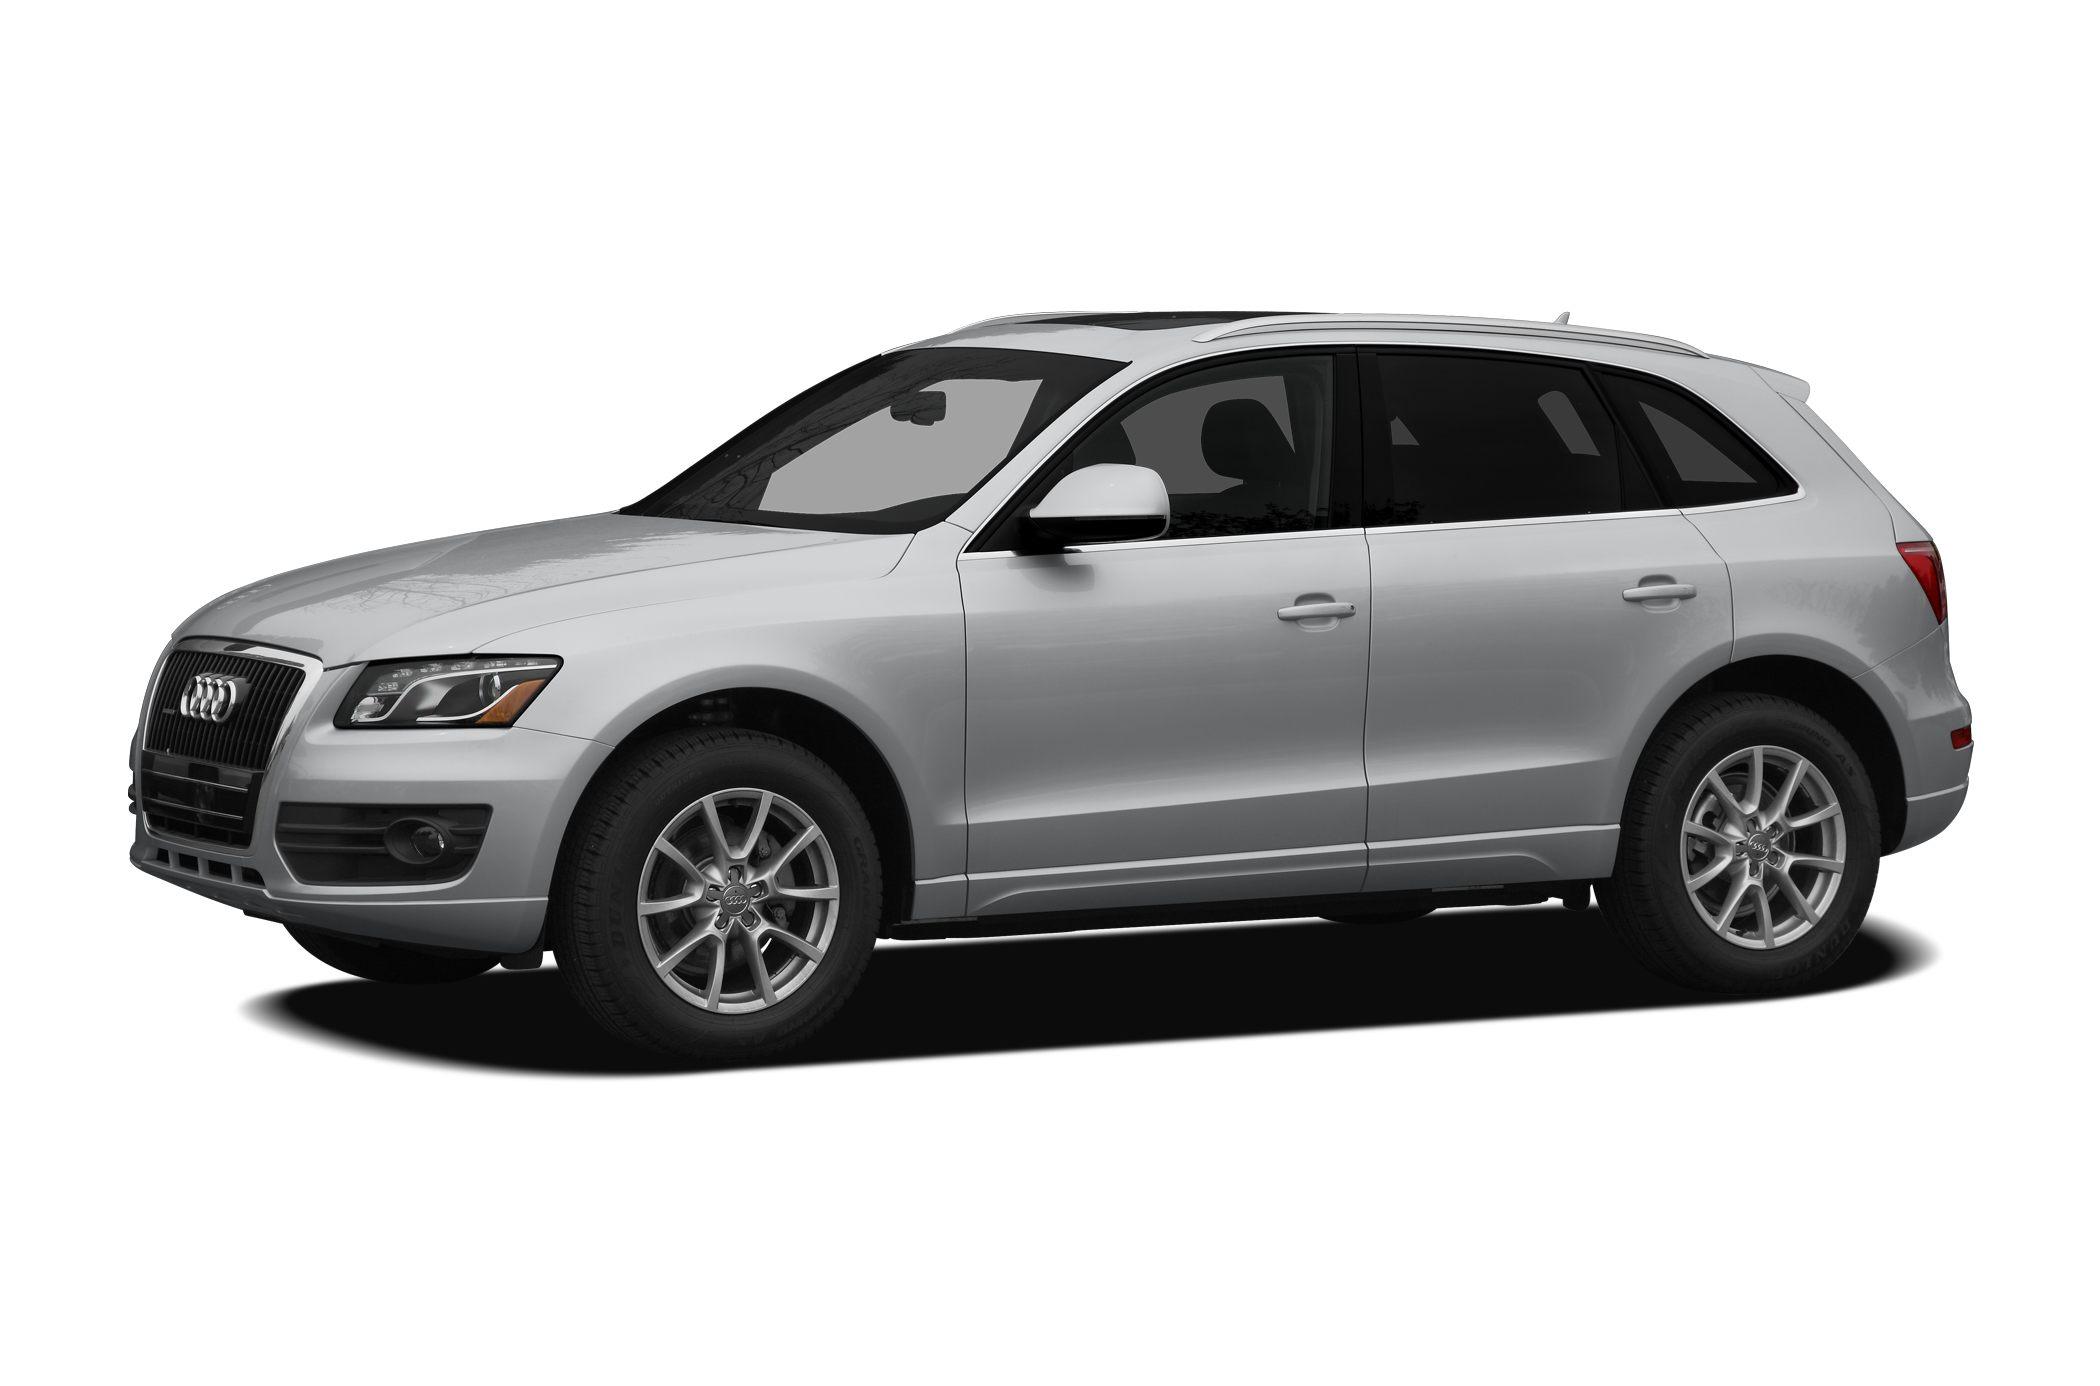 2012 Audi Q5 Information